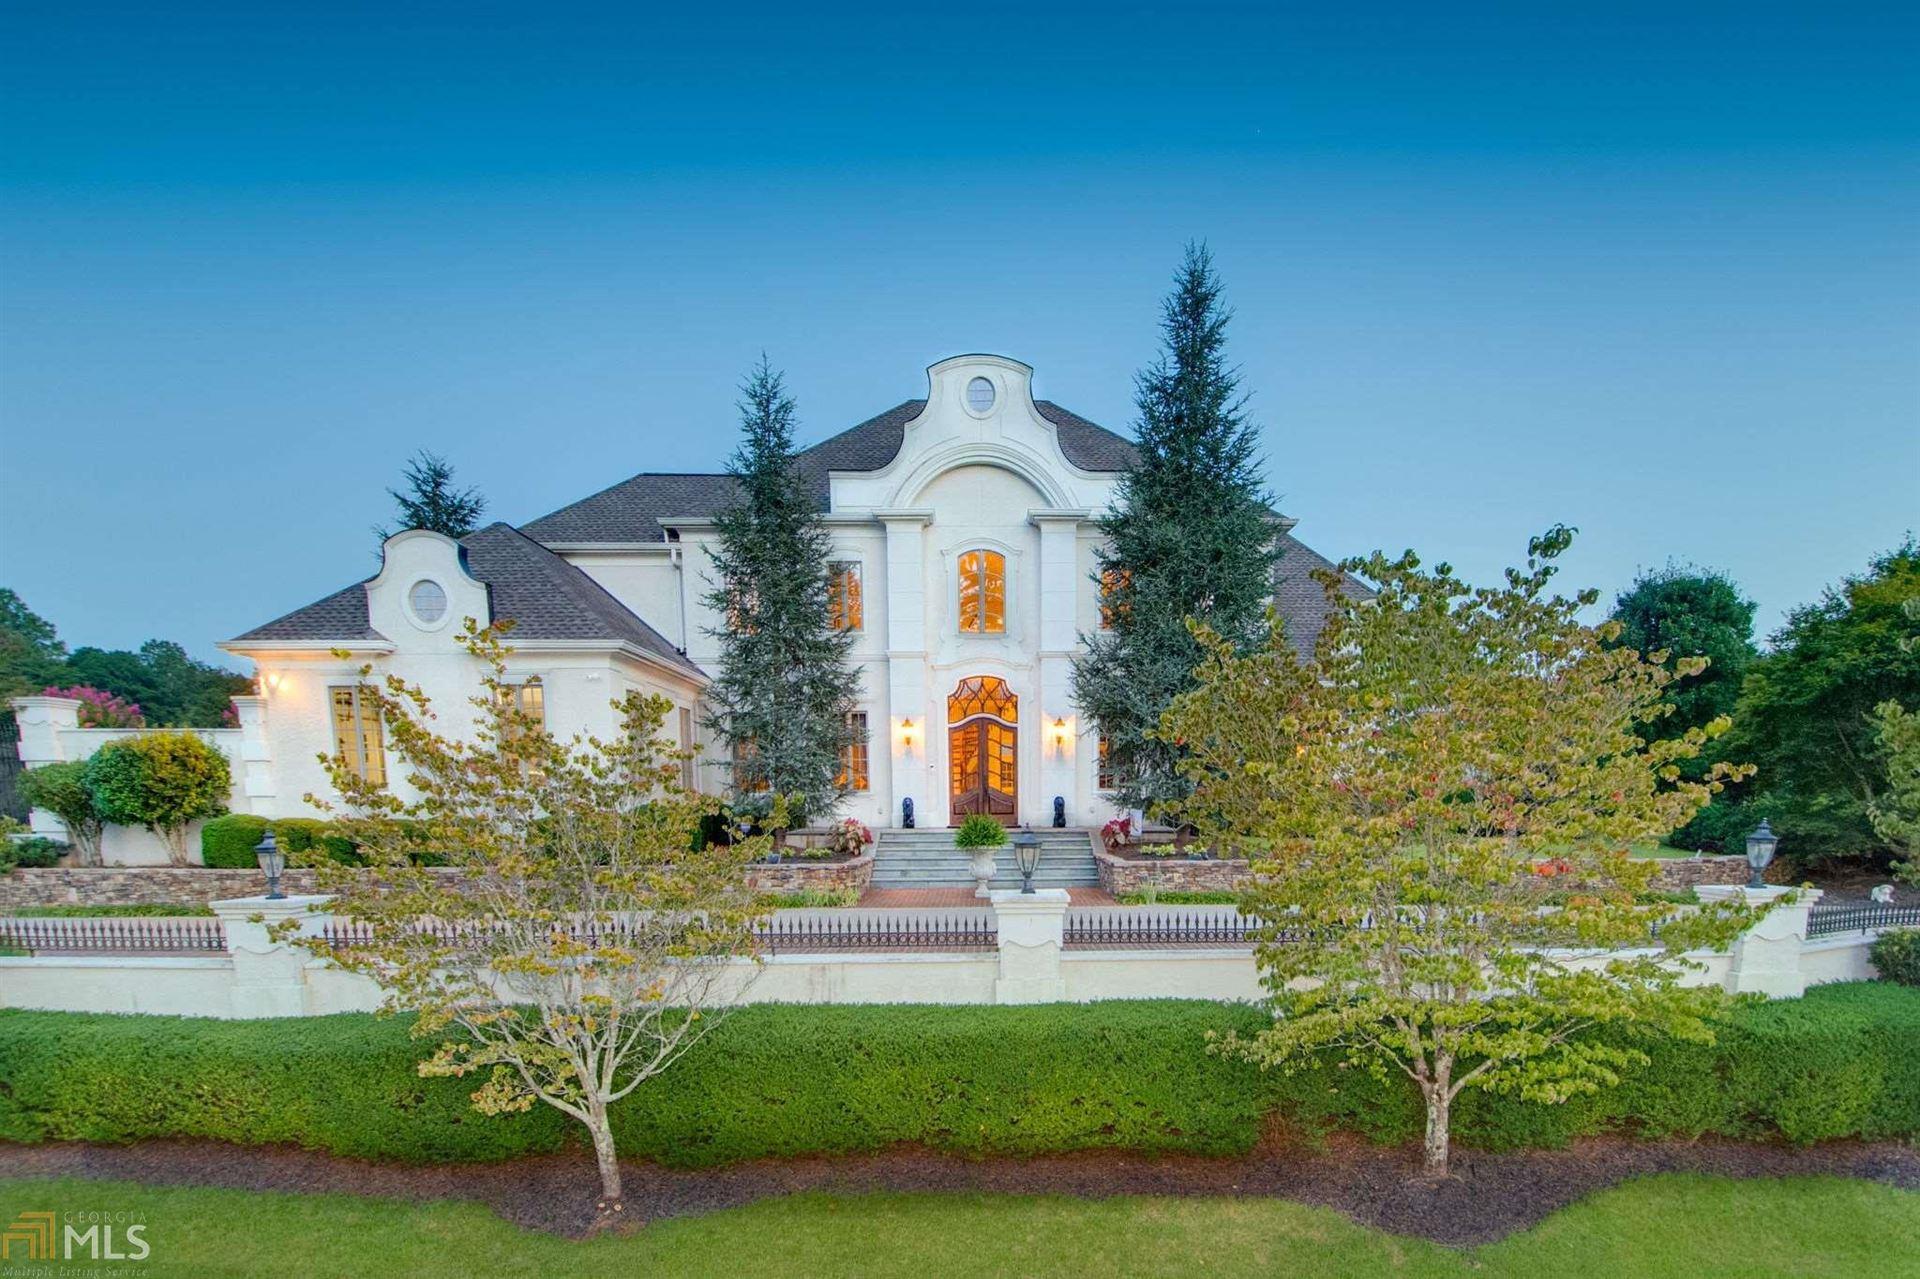 1621 Orchard Dr, Clarkesville, GA 30523 - MLS#: 8758786